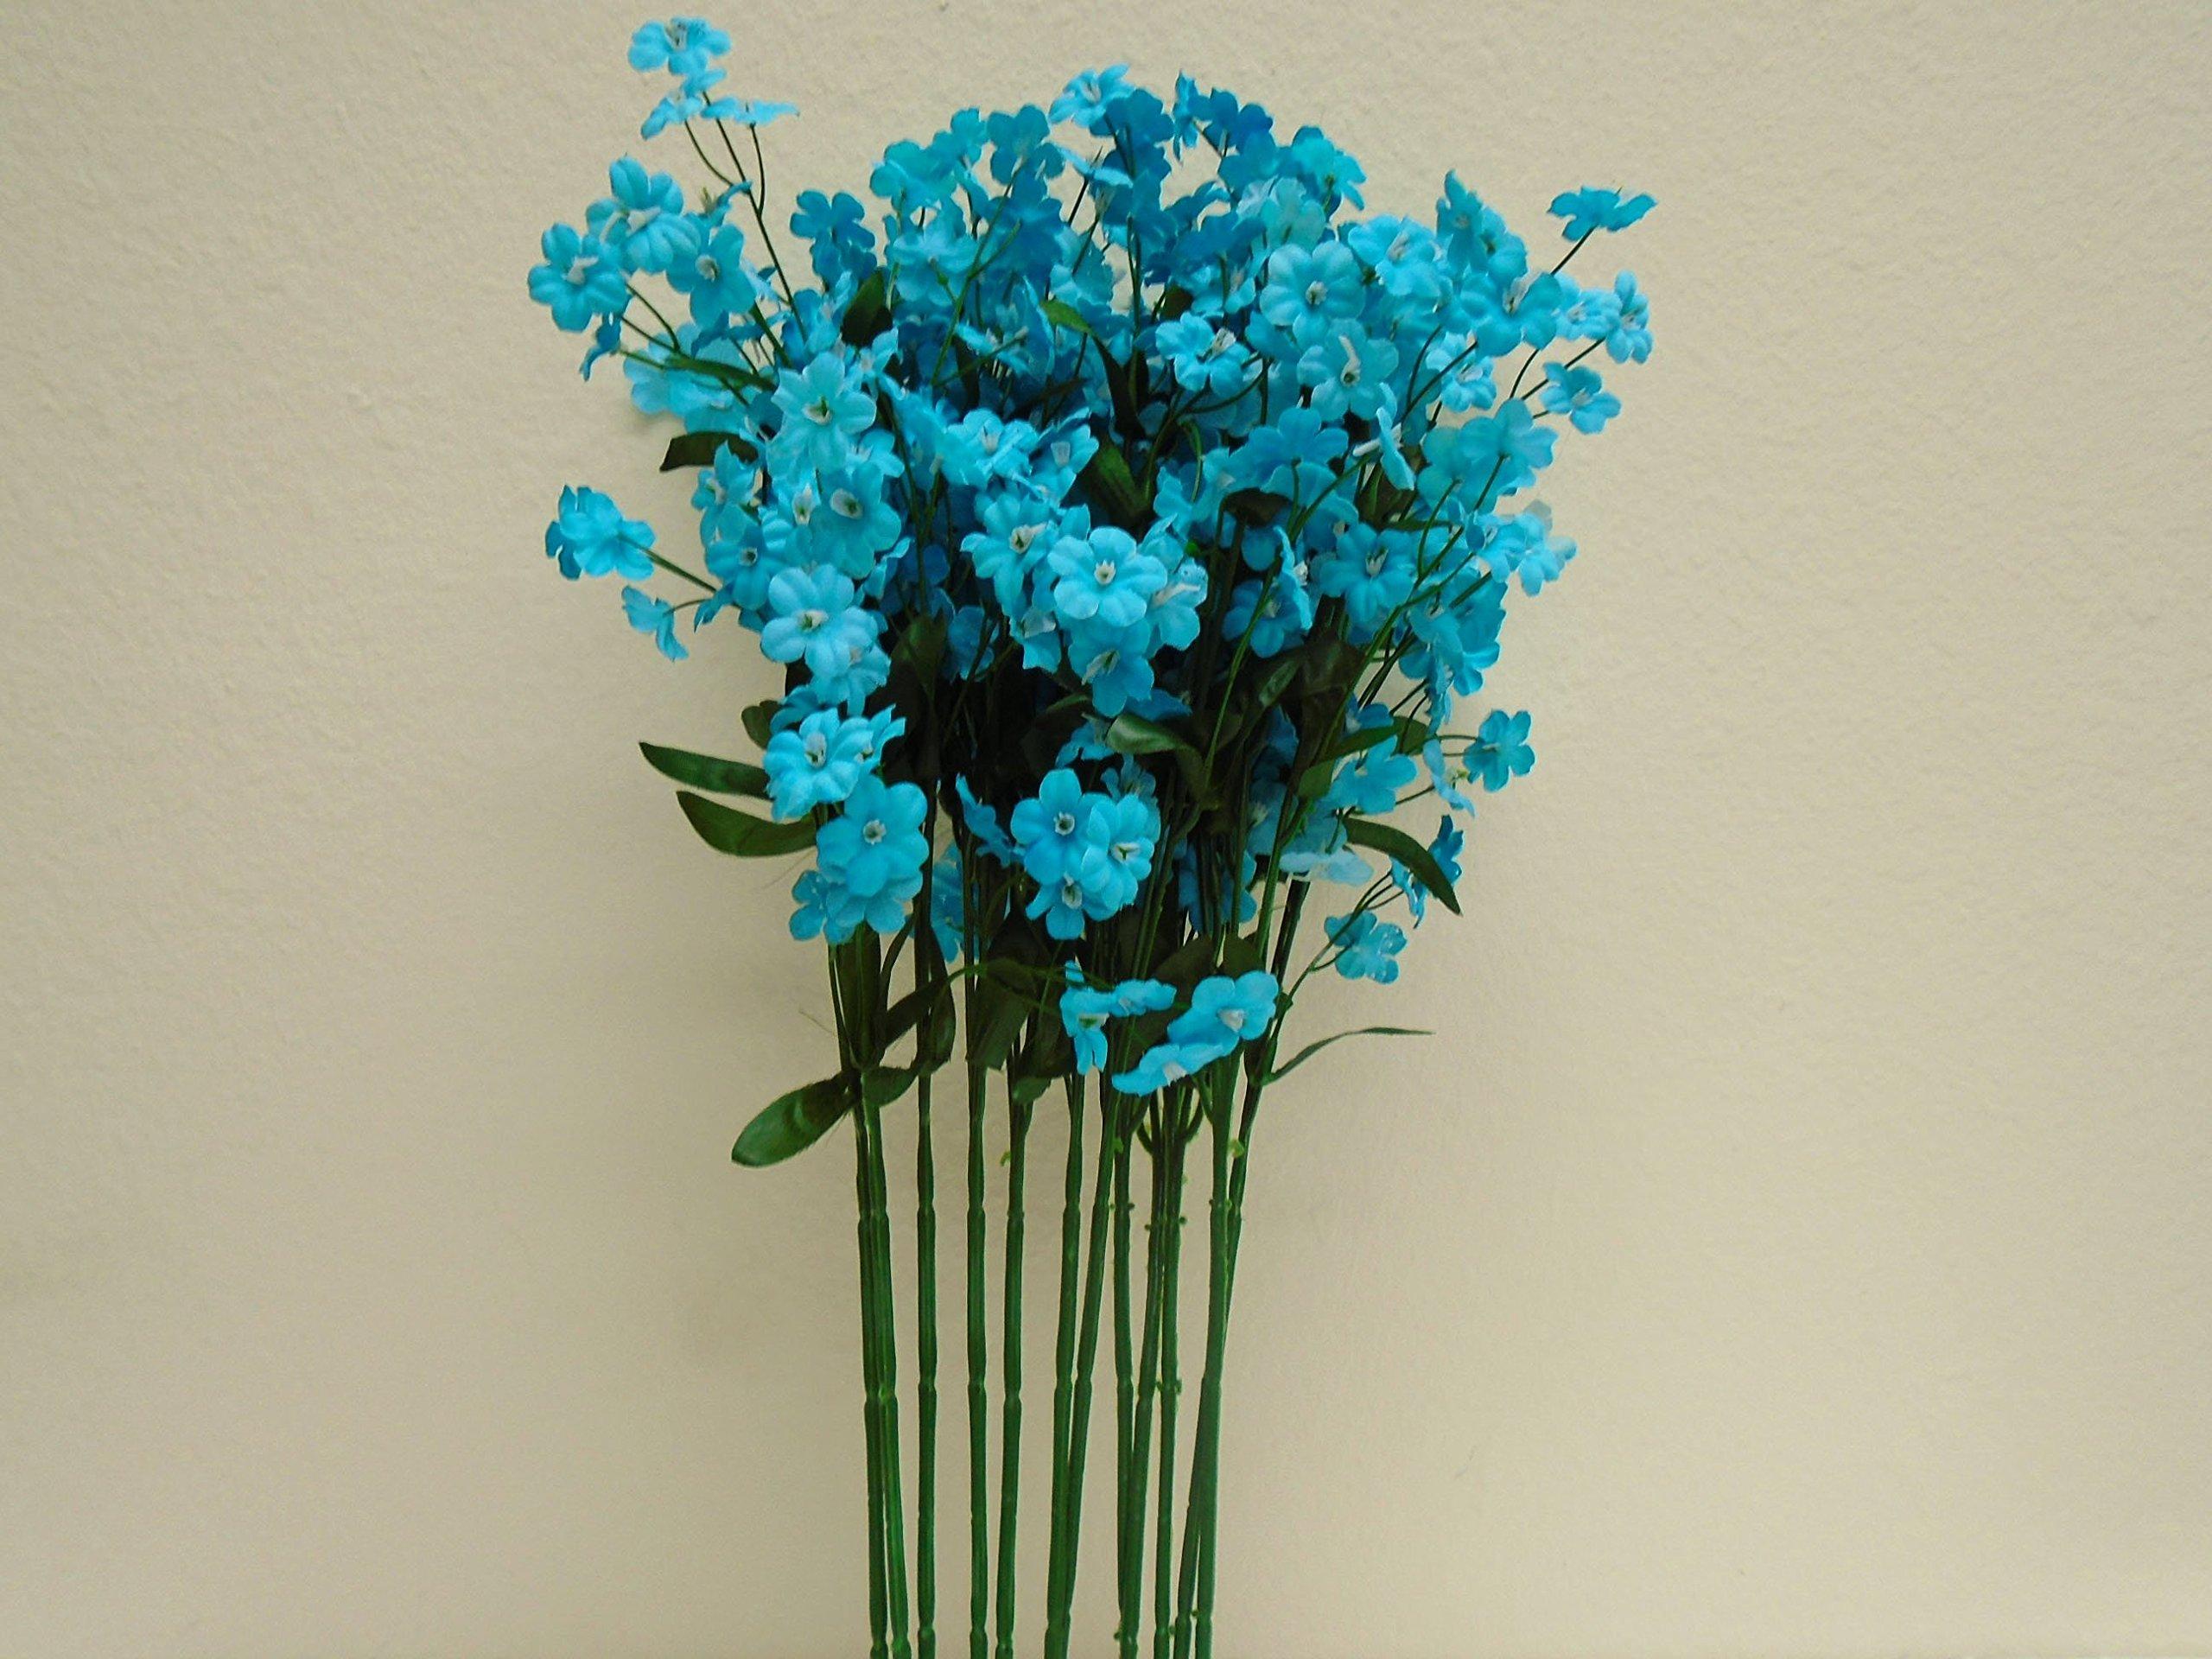 Phoenix-Silk-12-Sprays-Ruffle-Baby-Breath-Filler-Artificial-Silk-Flowers-18-Stem-828